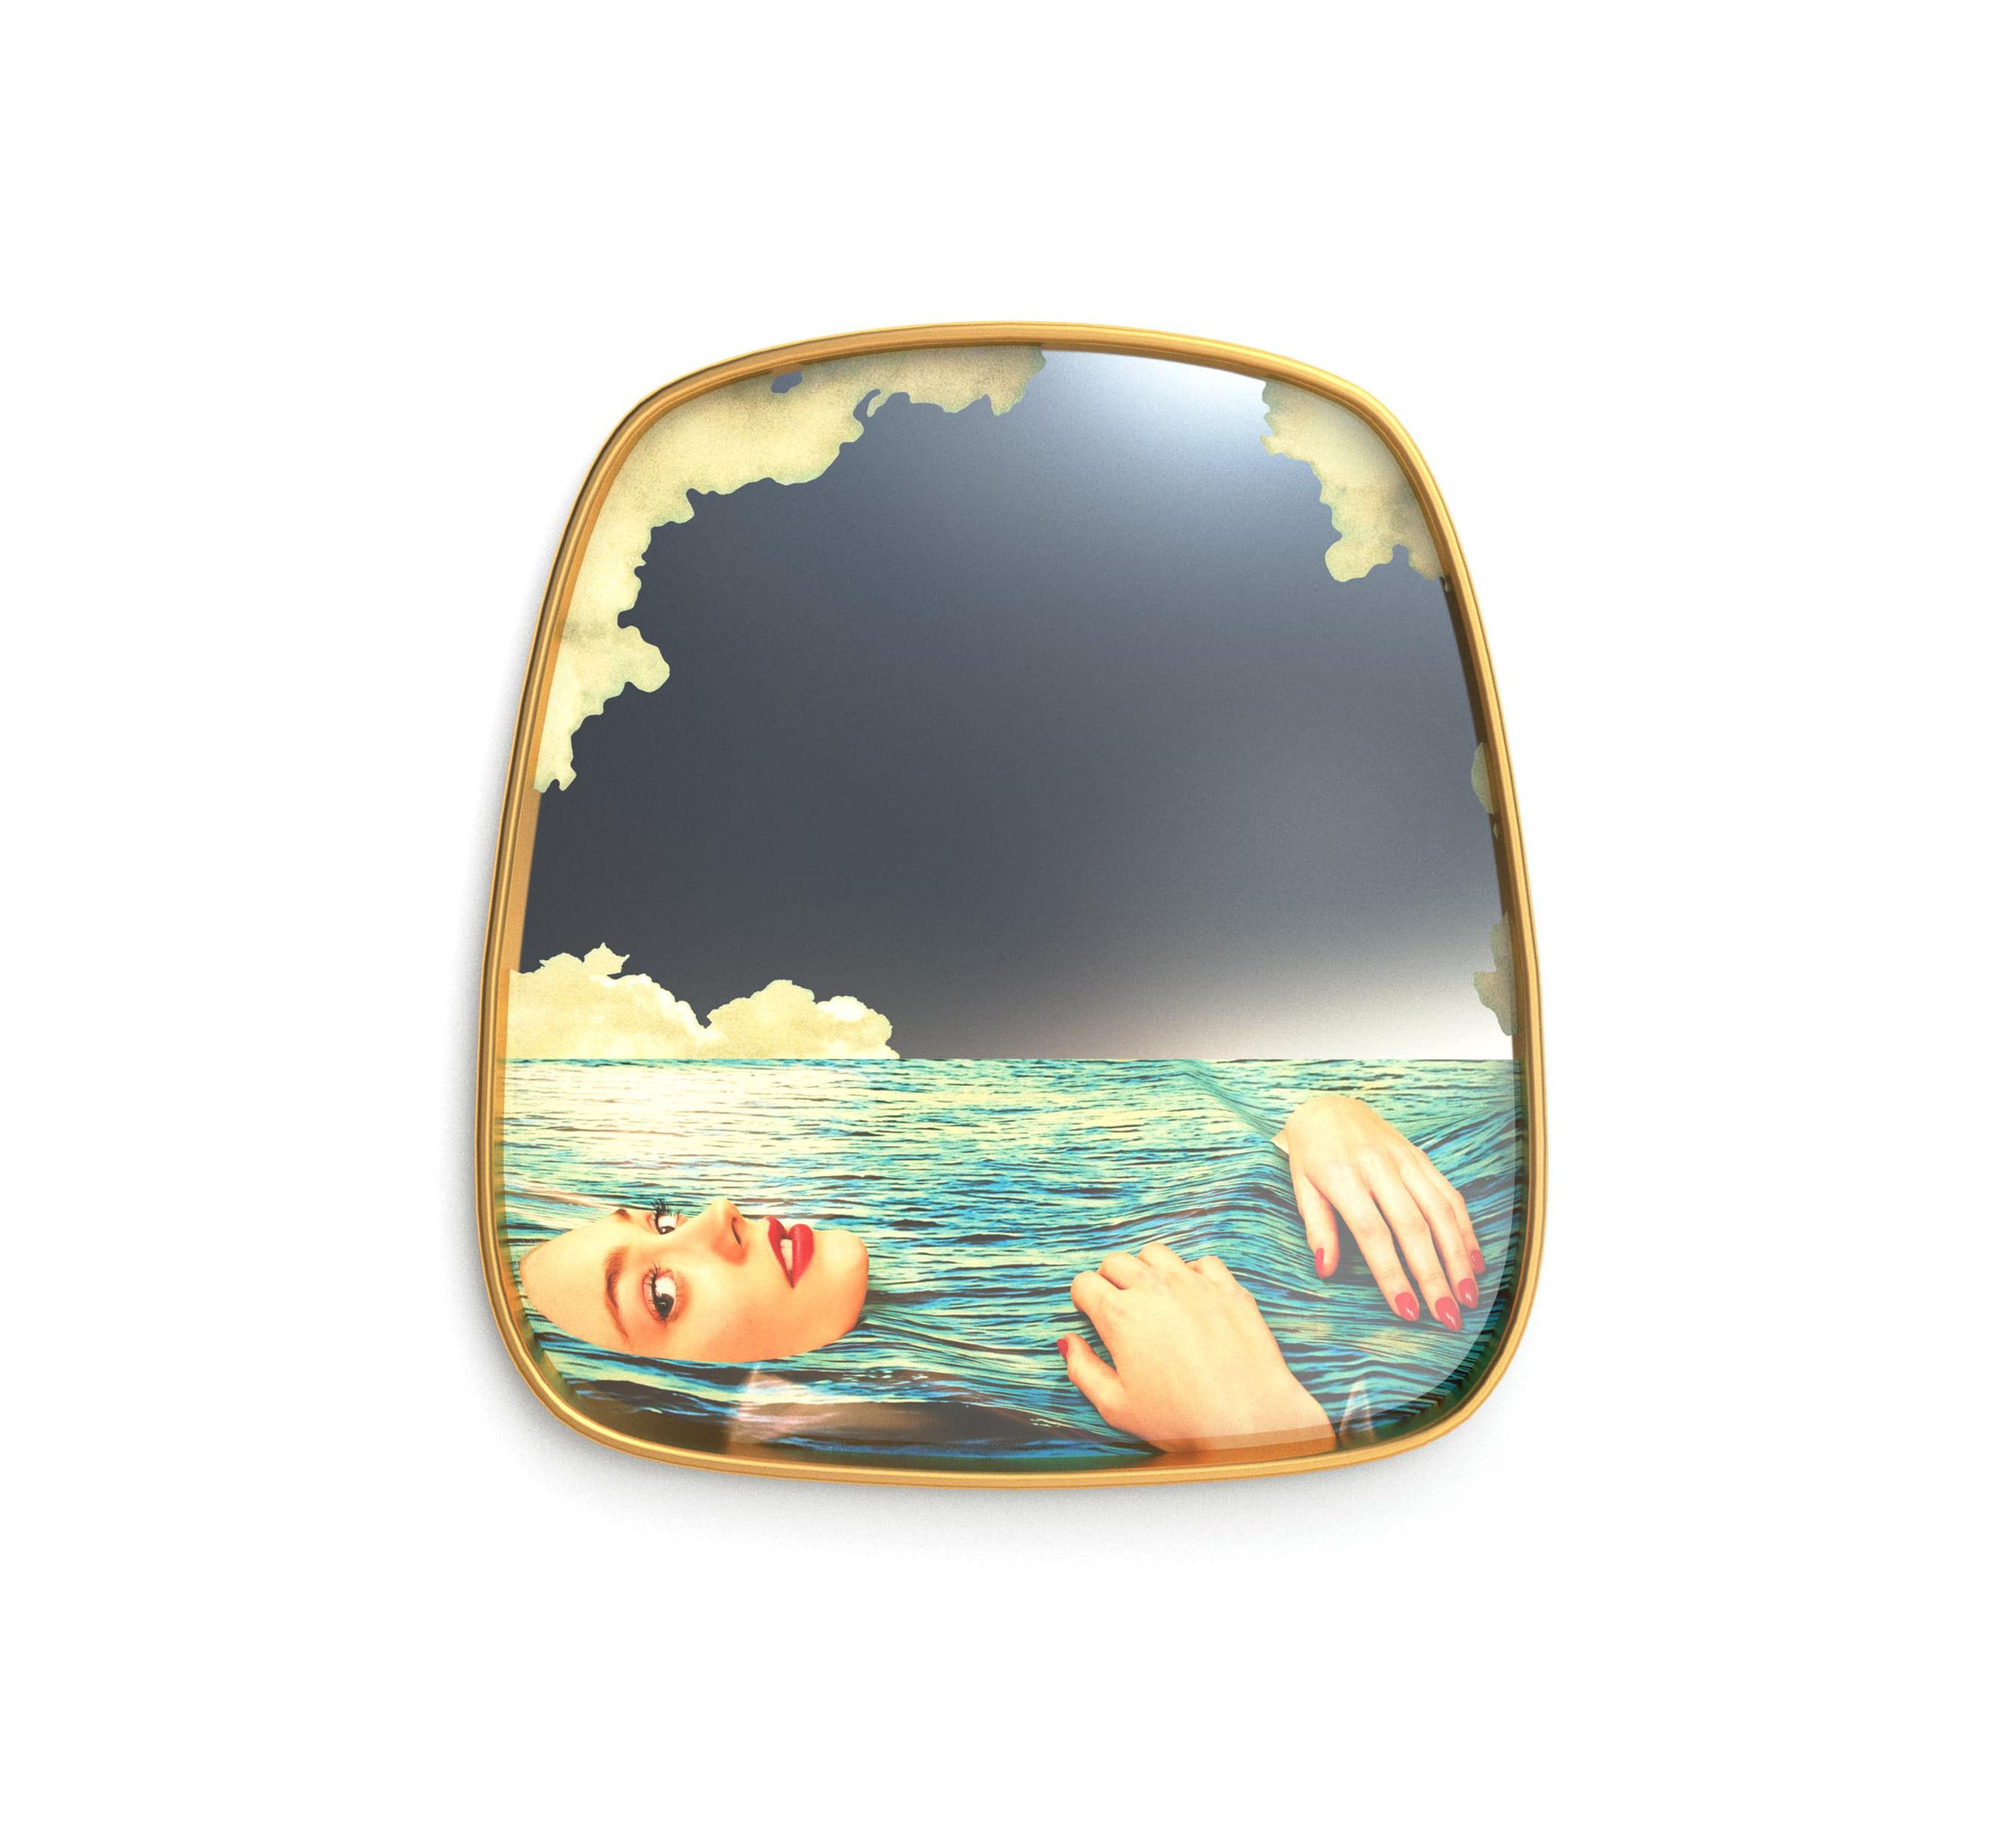 Decoration - Mirrors - Toiletpaper Mirror - / Sea Girl - 54 x 59 cm by Seletti - Sea Girl / Brass frame - Brass, Glass, MDF